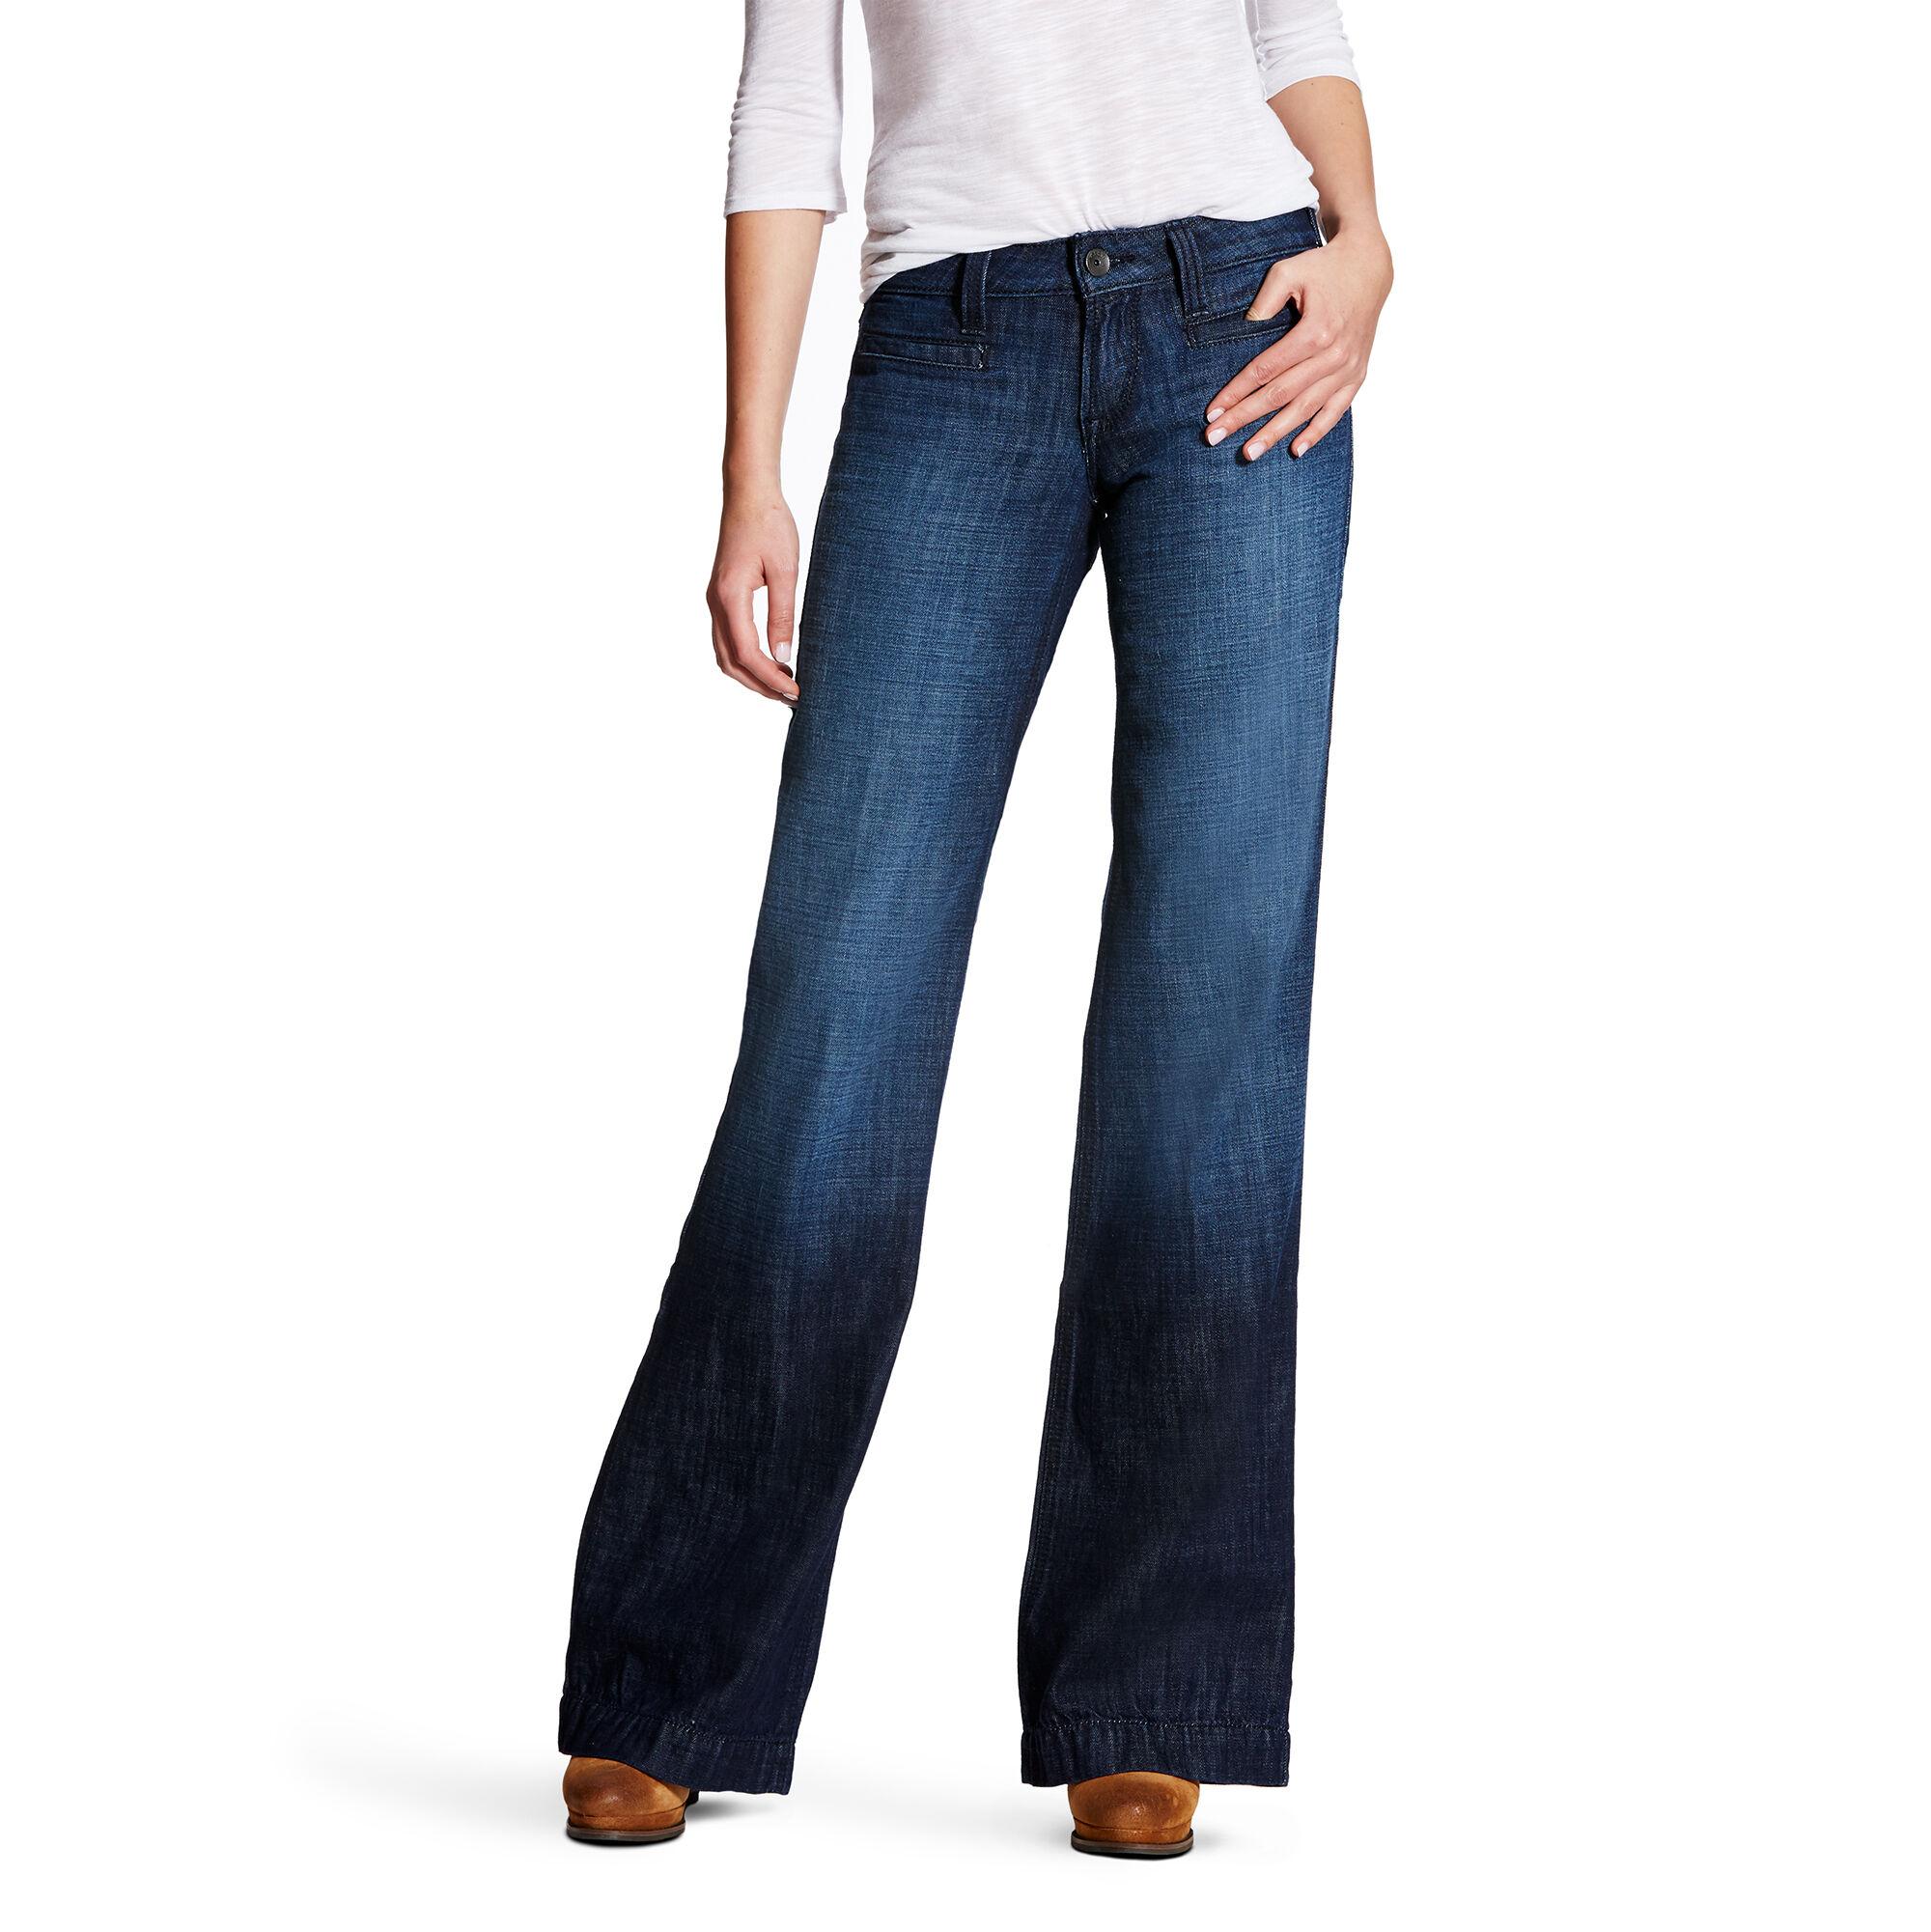 Jeans bootcut femme stretch